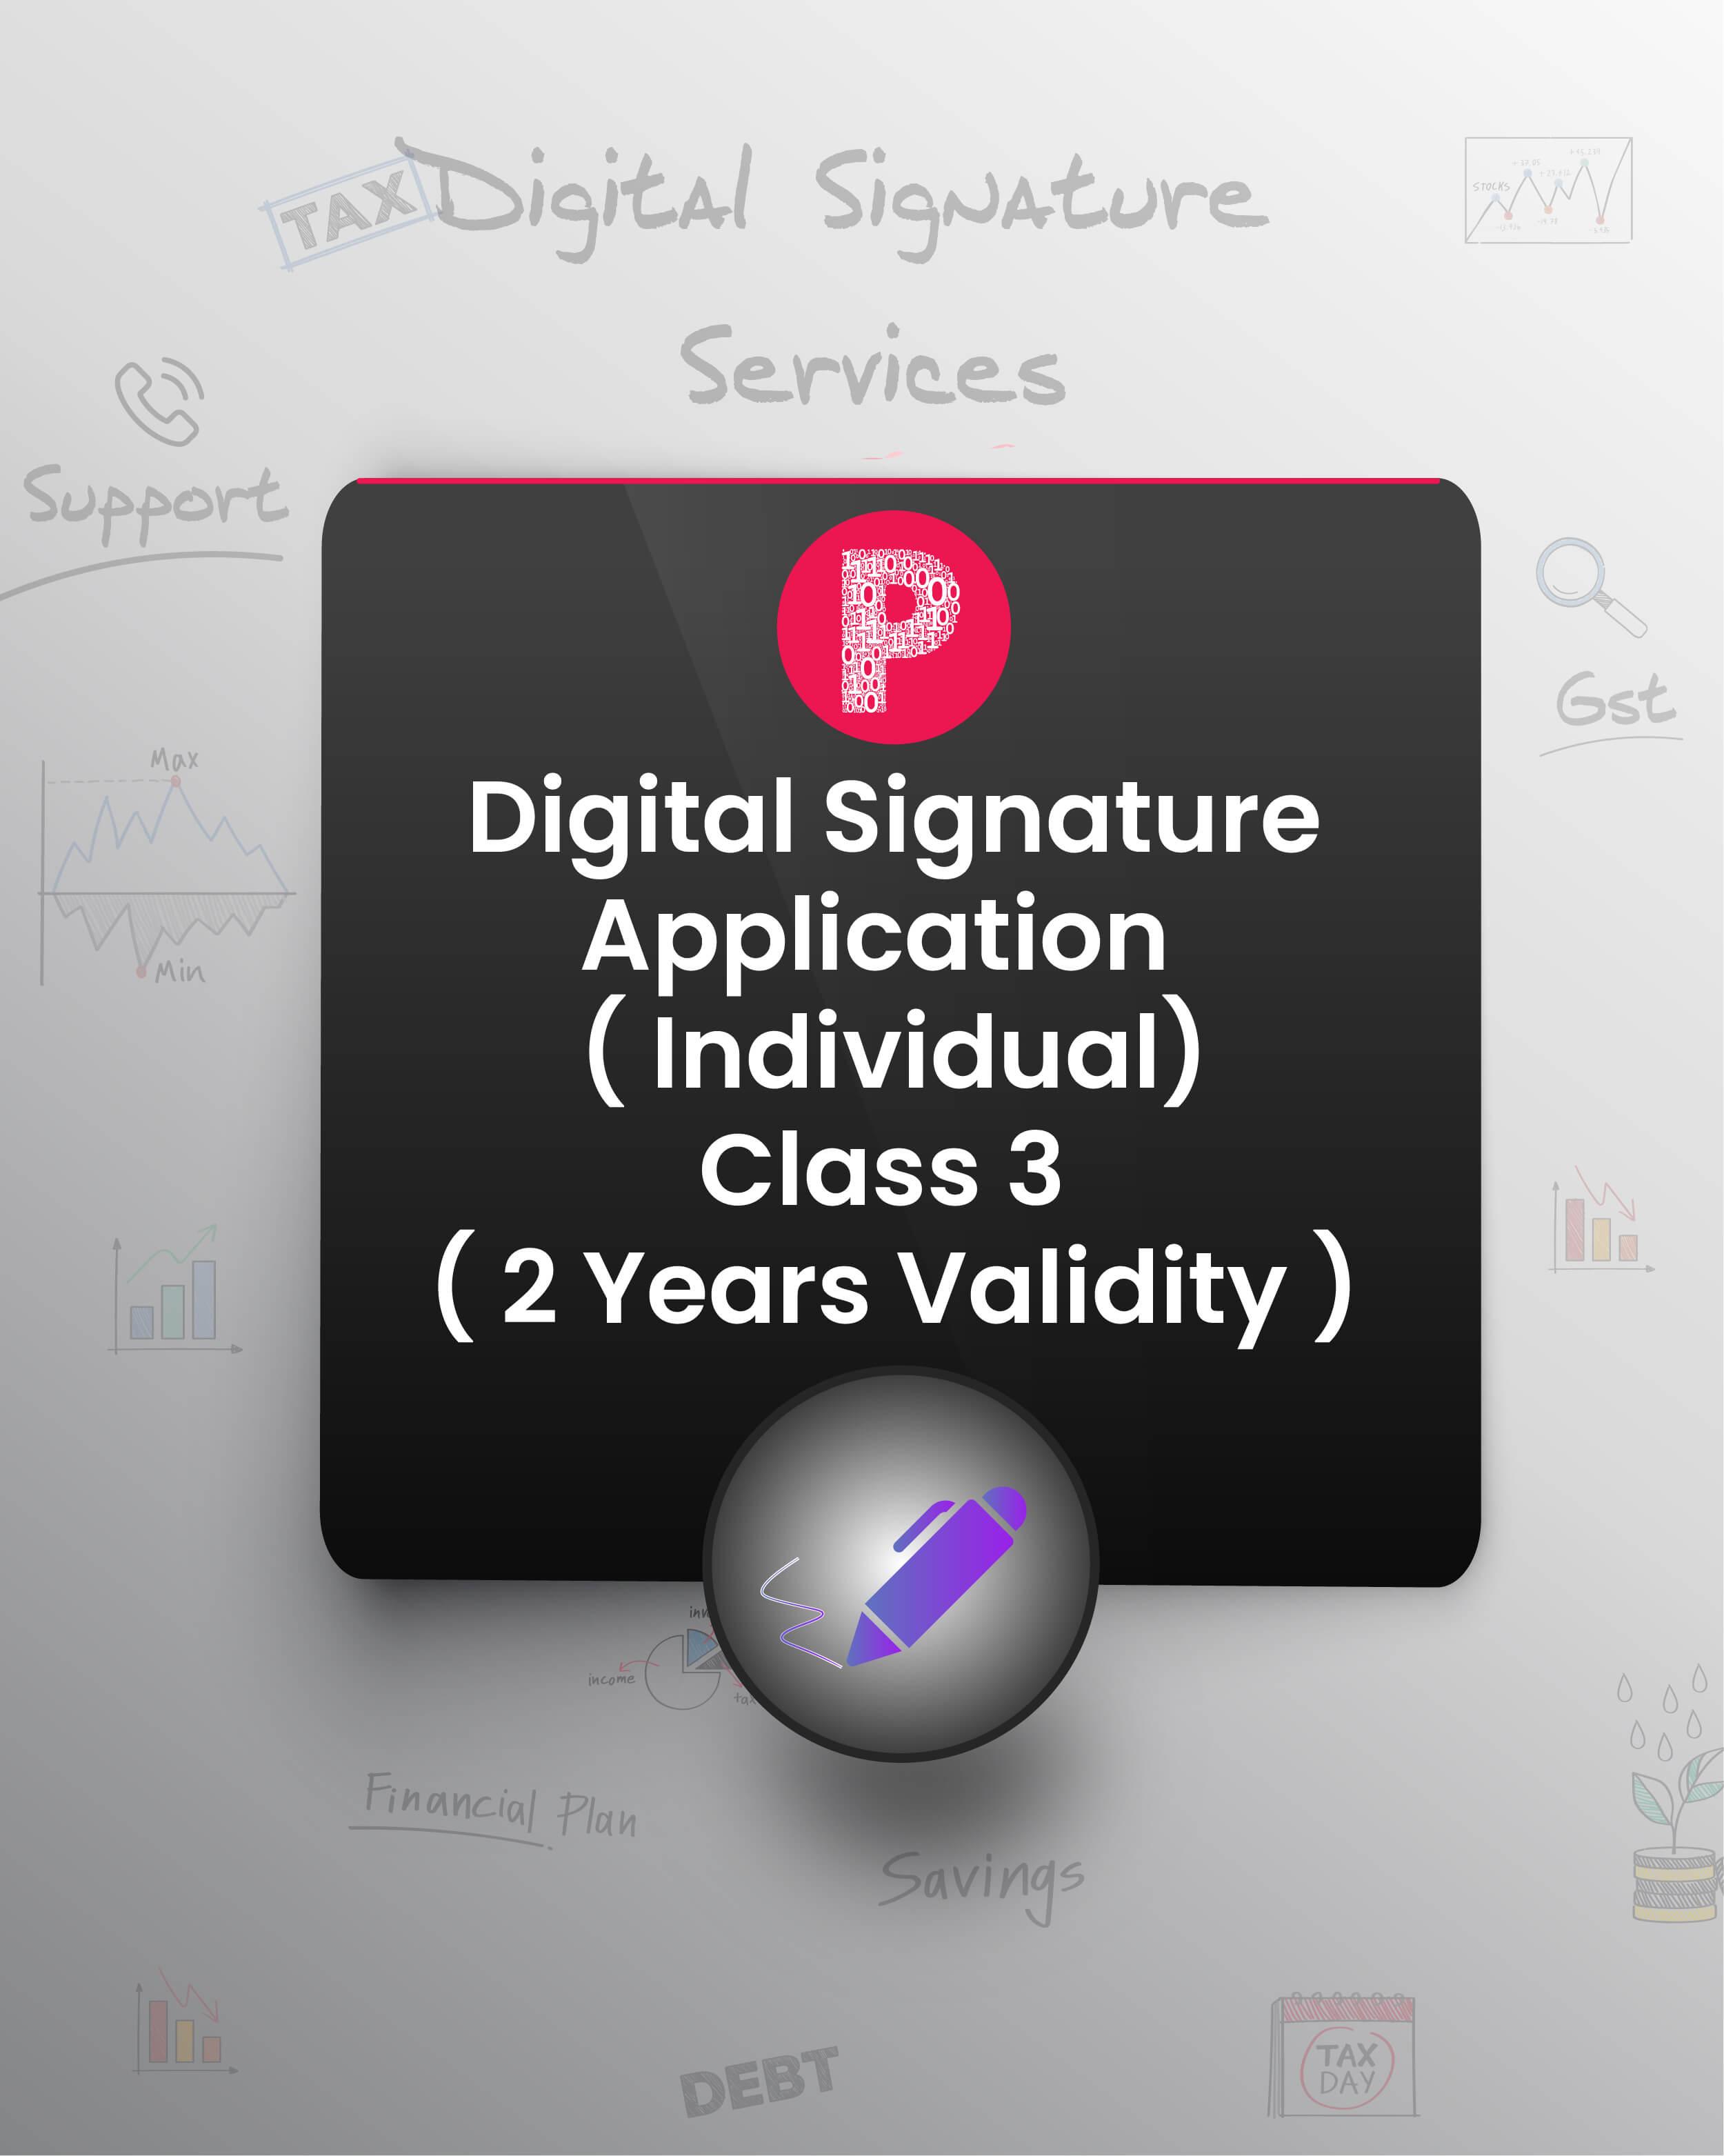 Digital Signature Certificate - Class 3 ( Individual ), Validity- 2 years